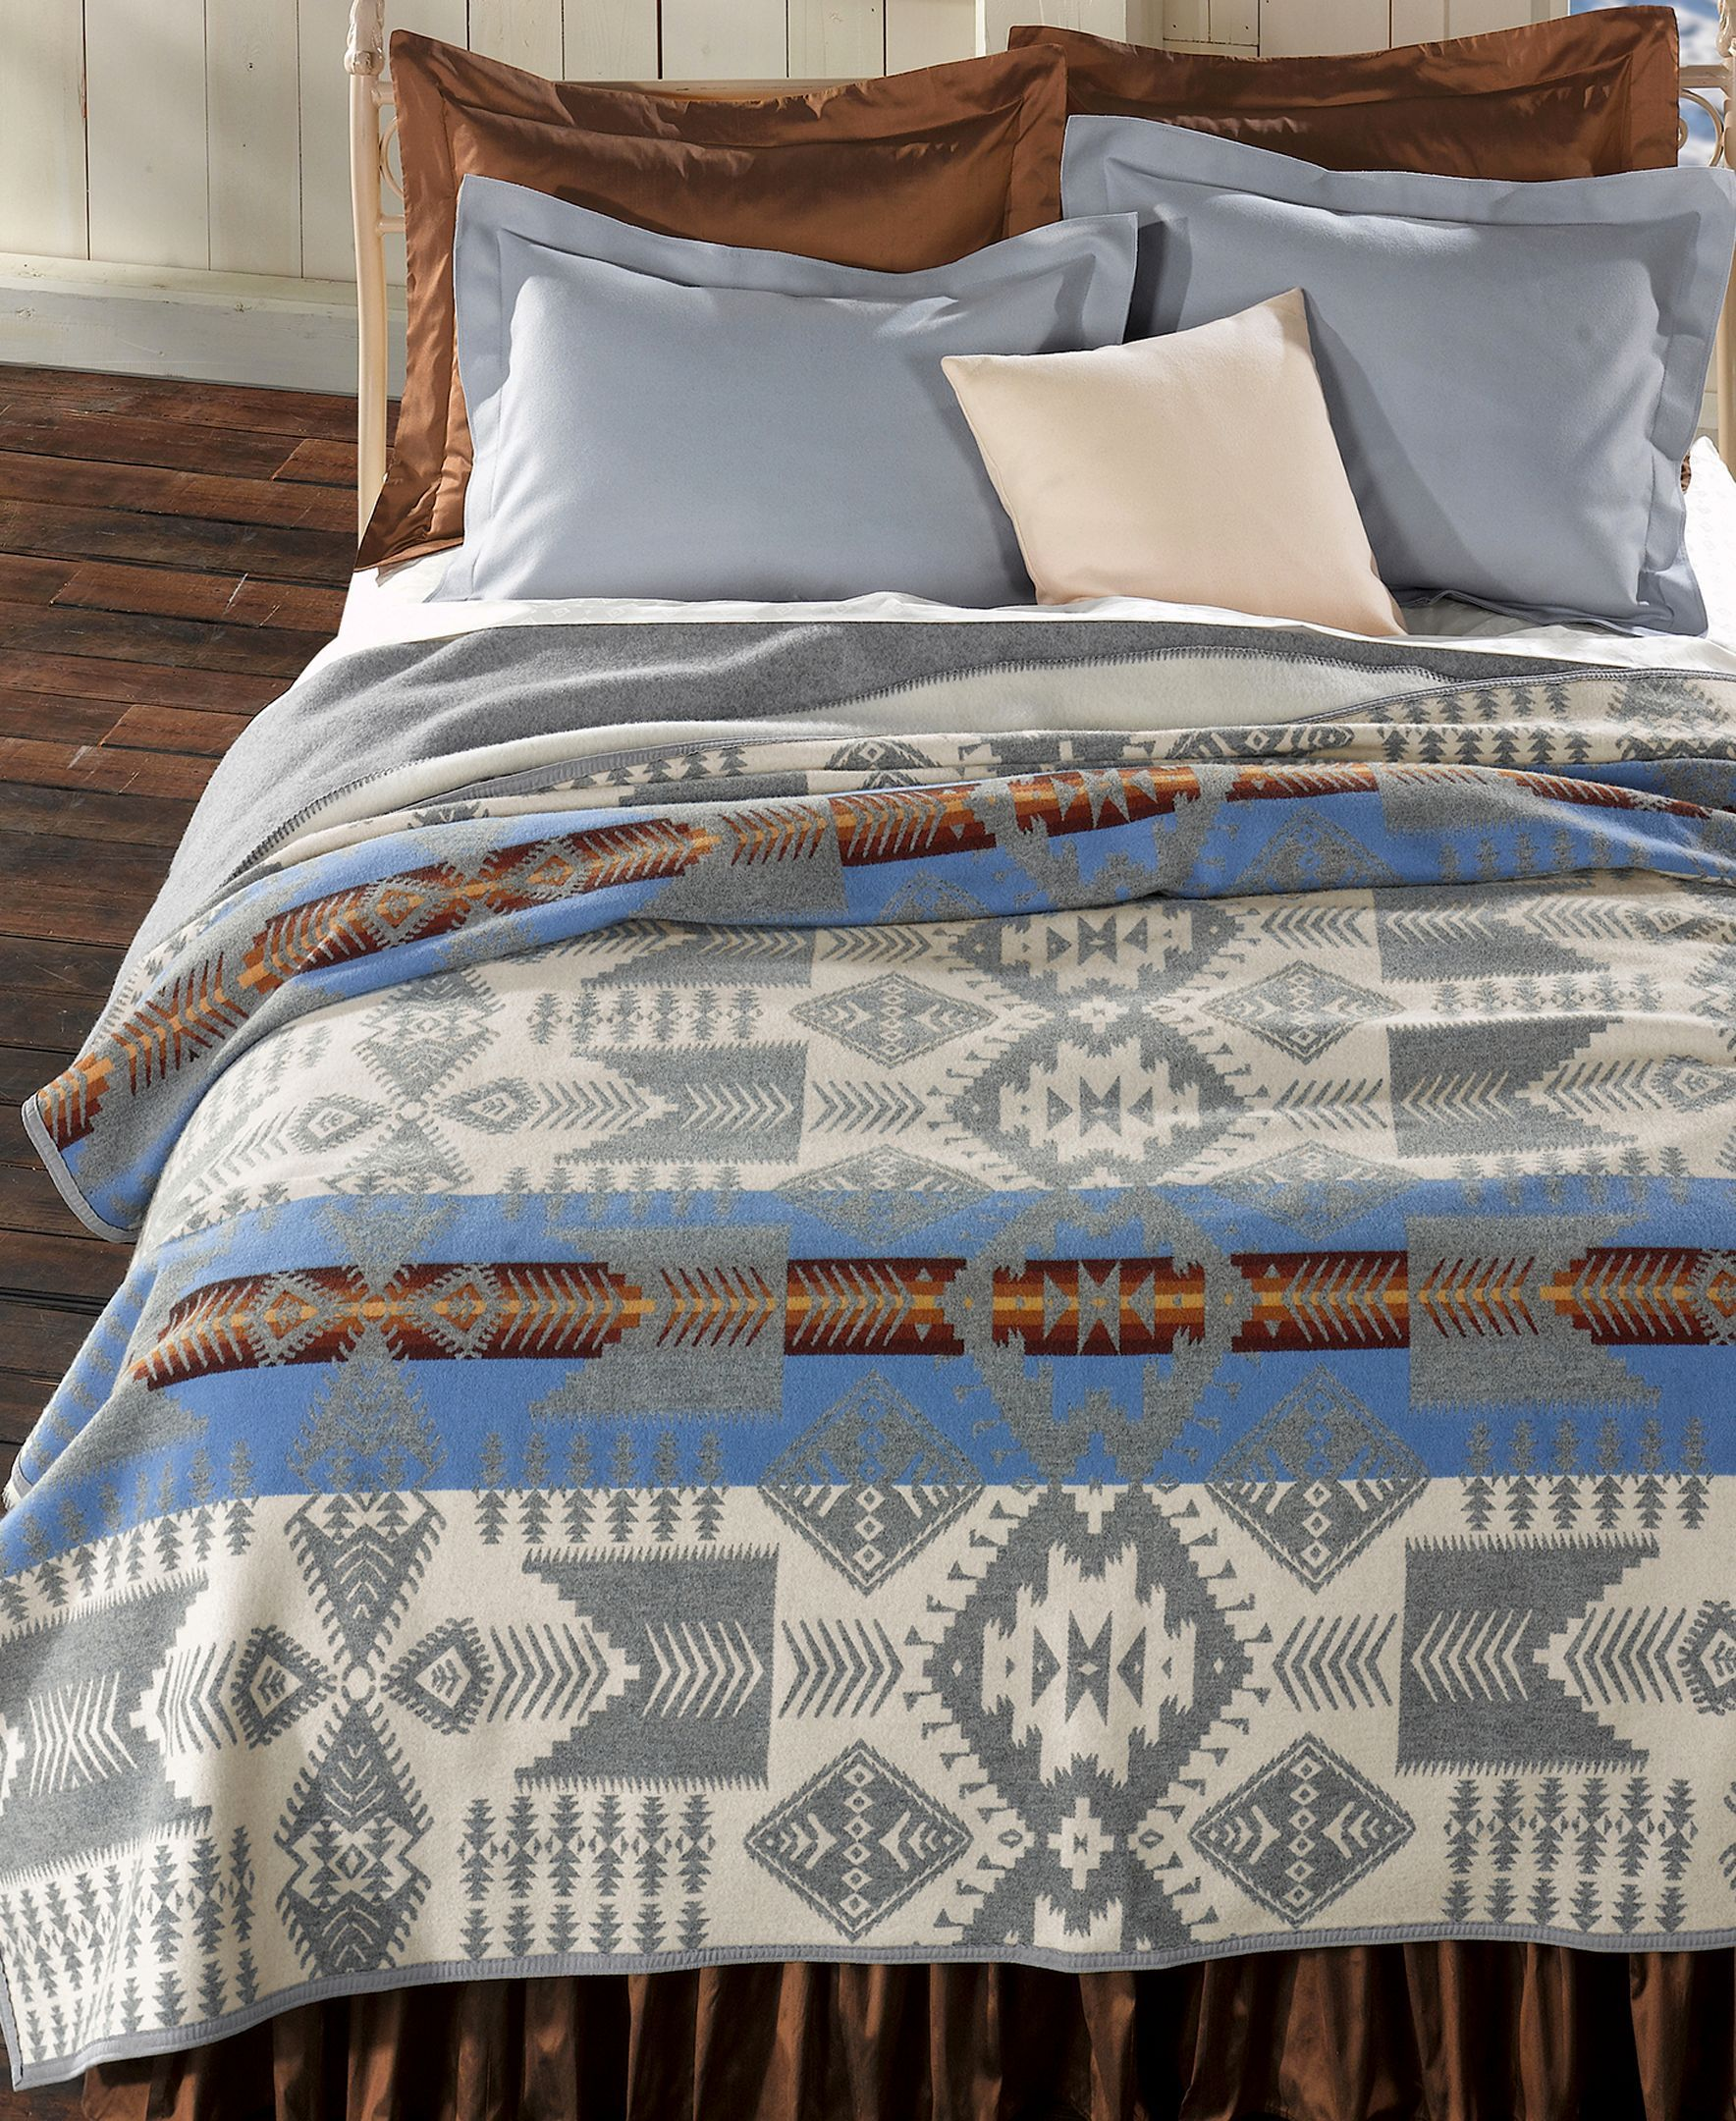 Pendleton Silver Bark Heritage Wool Queen Blanket Reviews Blankets Throws Bed Bath Macy S Pendleton Blanket Queen Blanket Pendelton Blankets